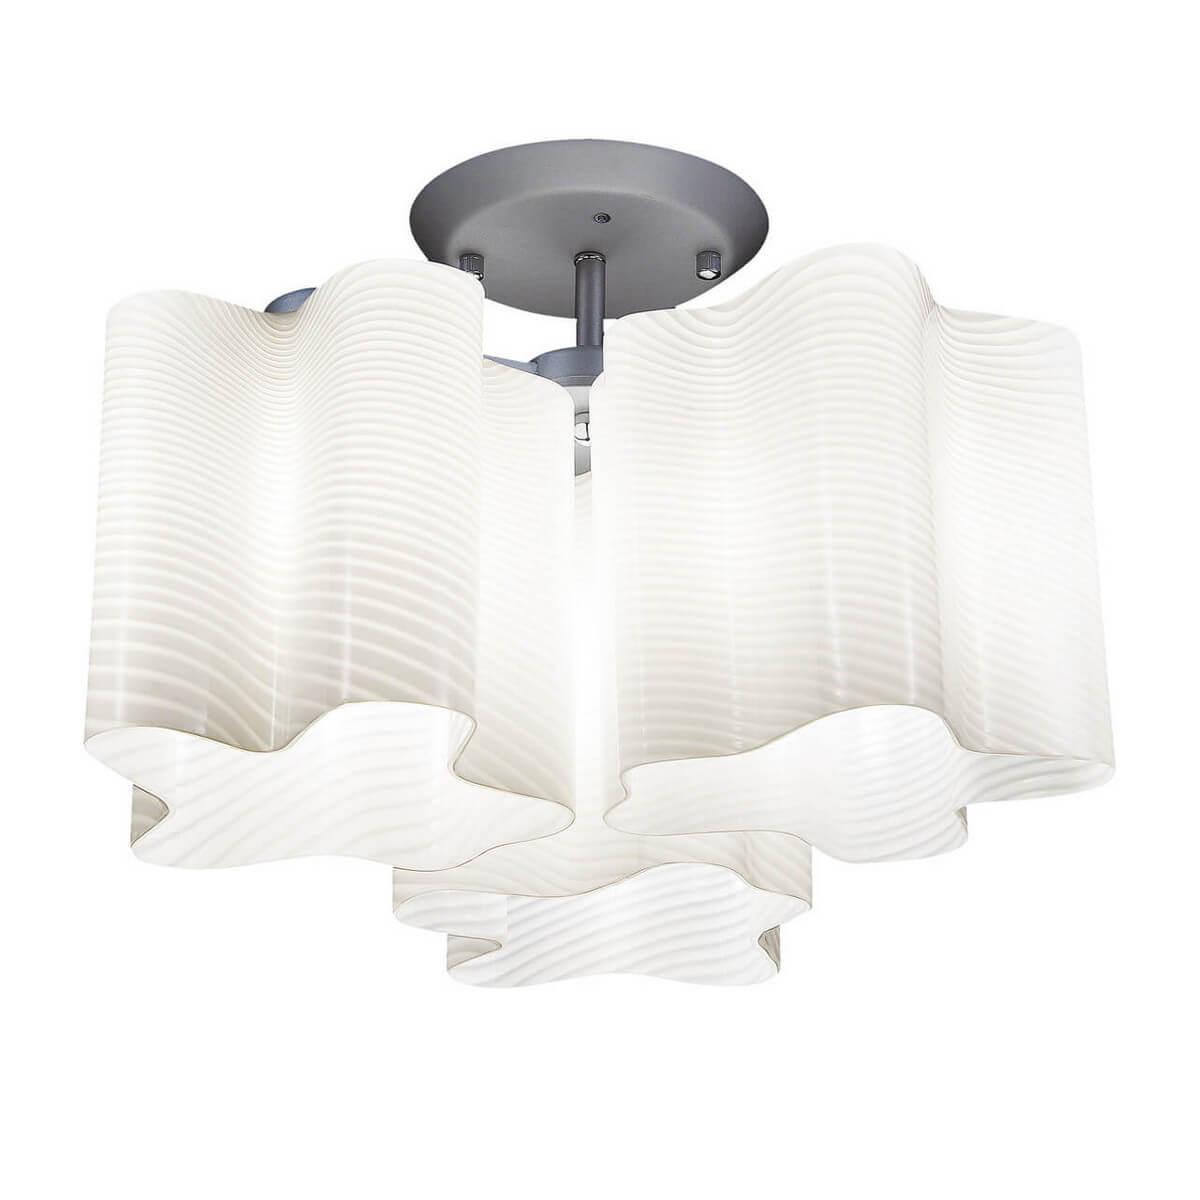 Потолочный светильник Lightstar 802031, E27, 40 Вт lightstar 214316